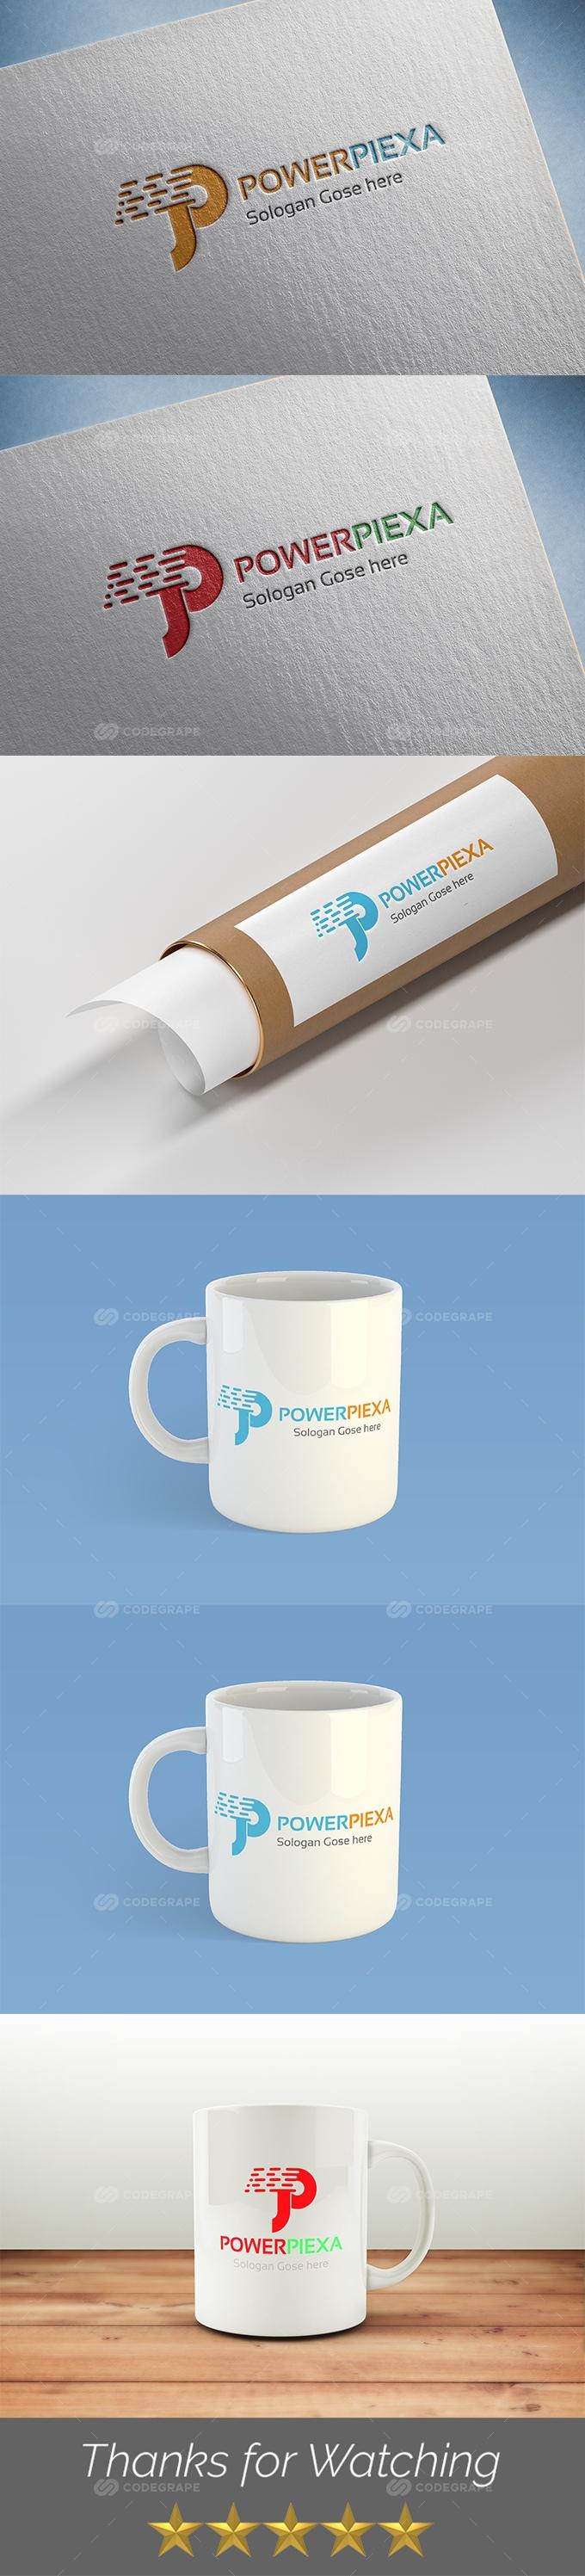 PowerPiexa (P Letter) Logo